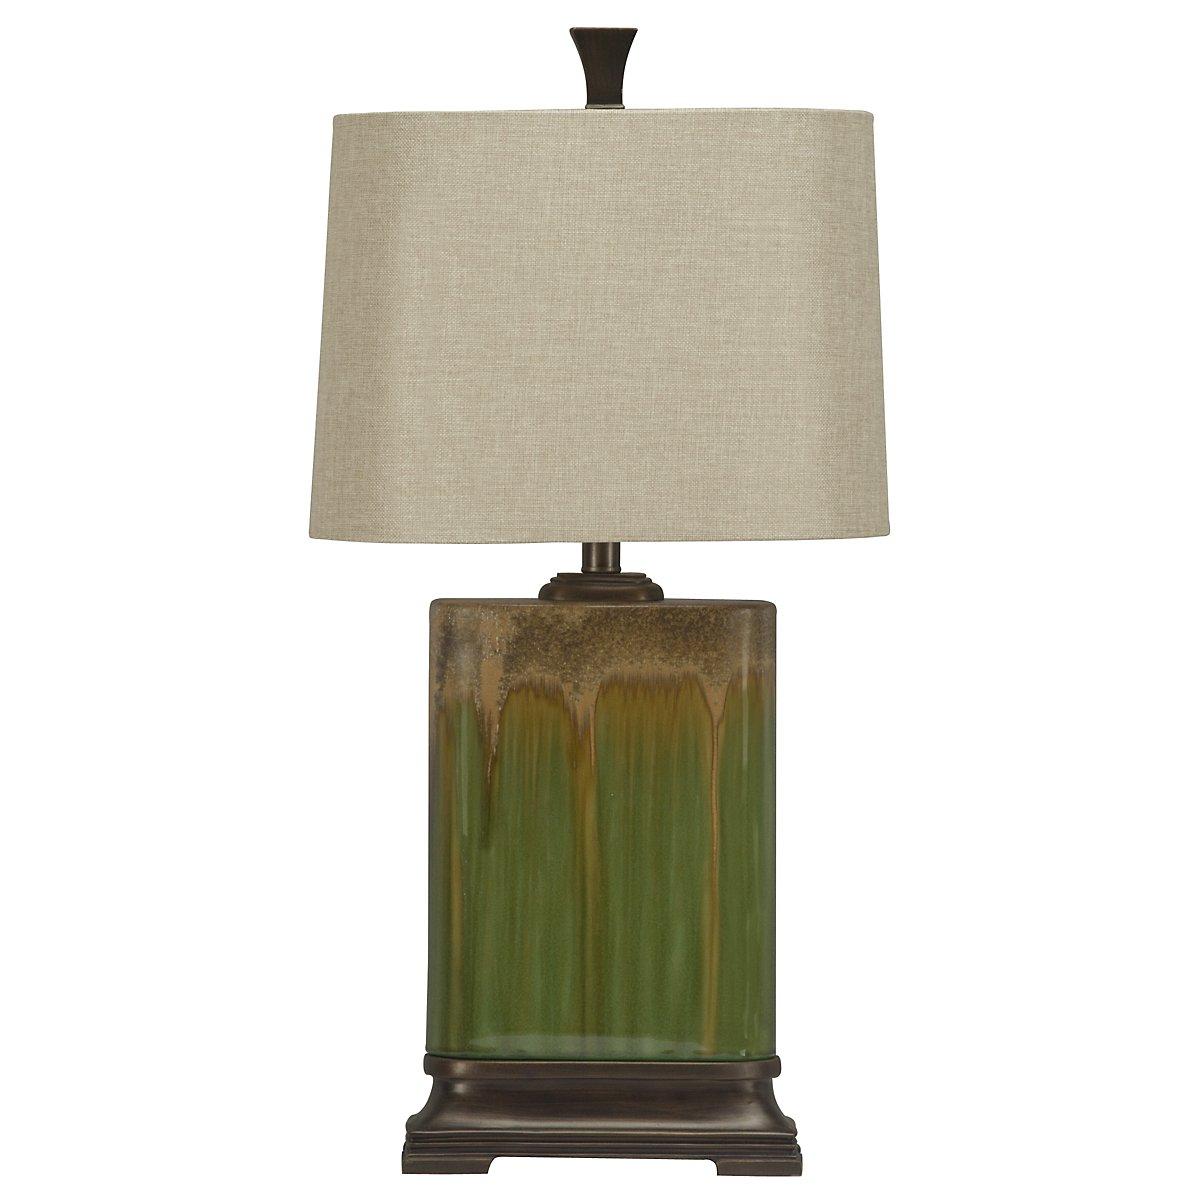 Summer Green Table Lamp